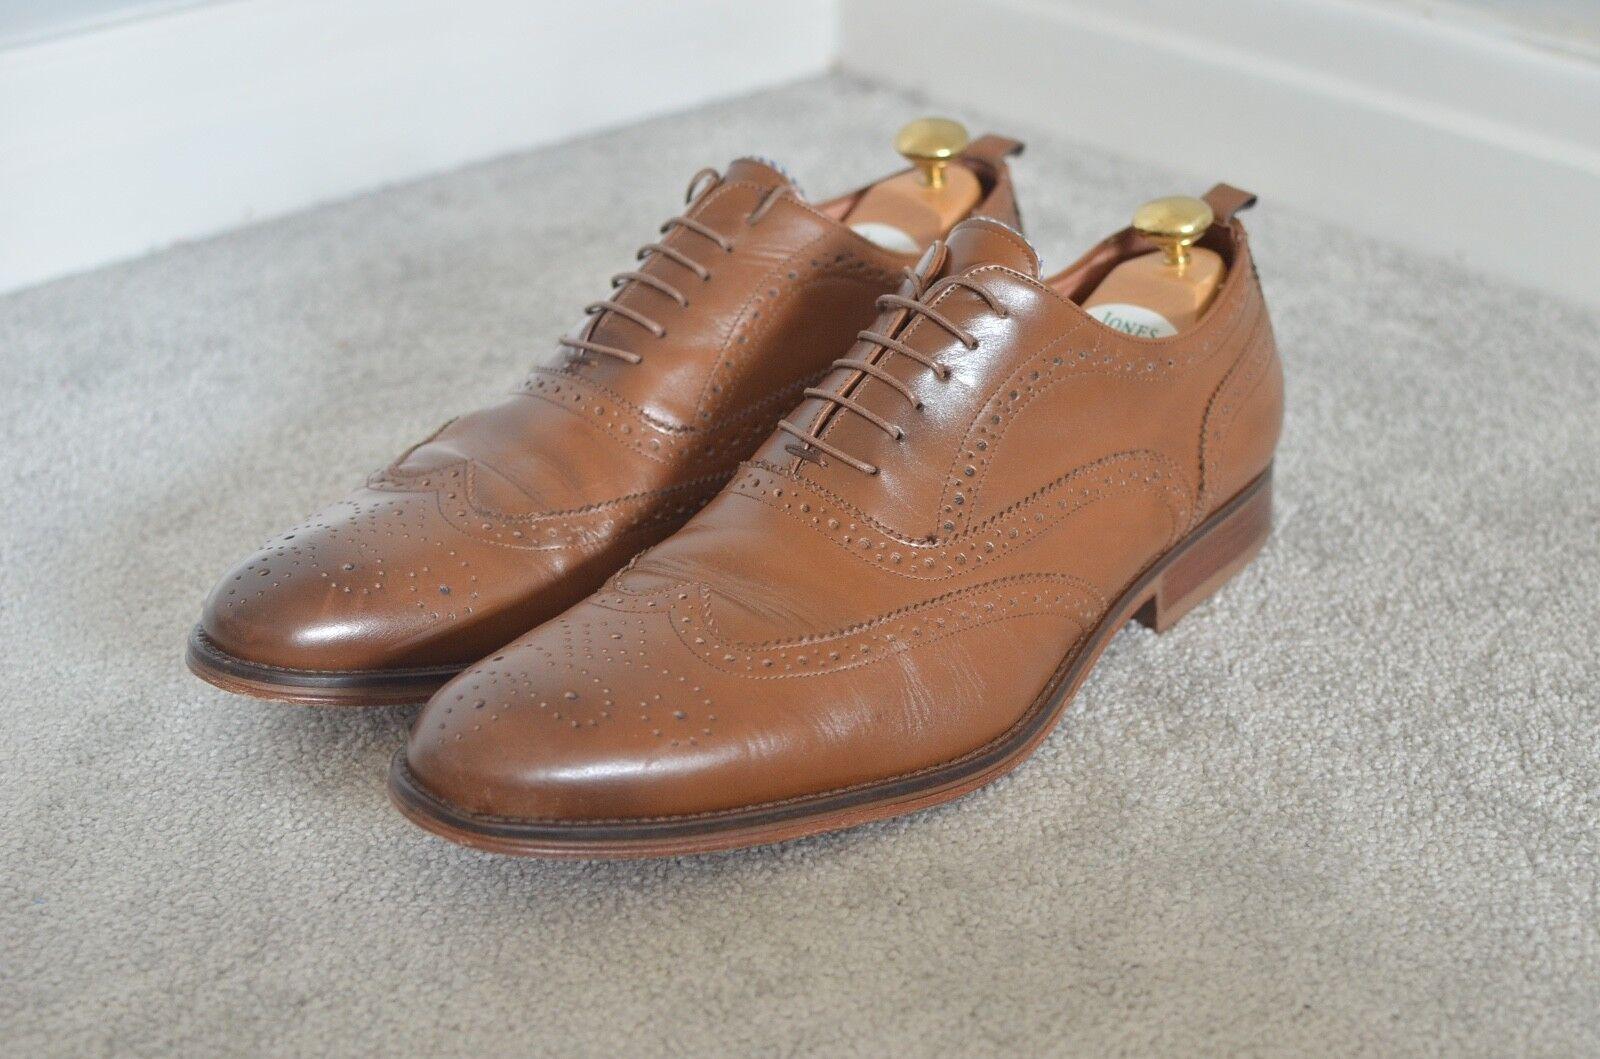 AUSTIN REED Suit maker braun genuine leather smart smart smart oxford brogues schuhe 46 12 65911f